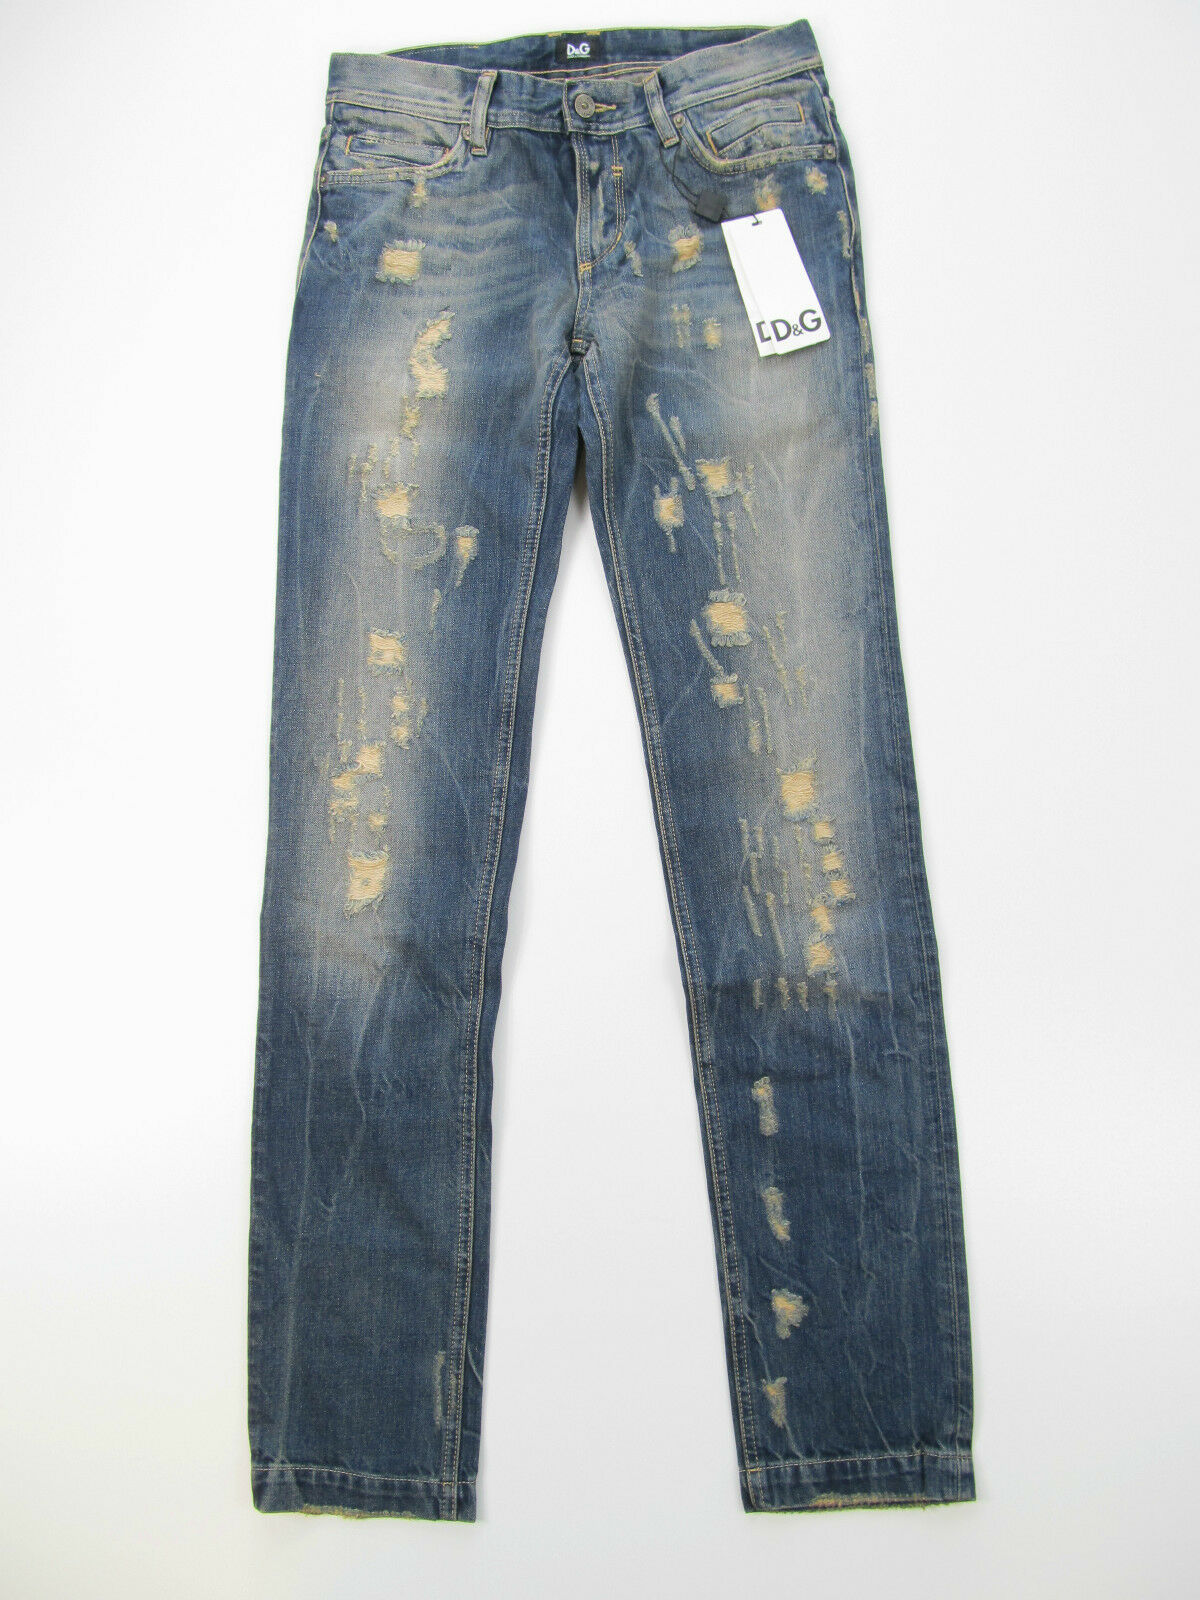 D&G Dolce&Gabbana Jeans Hose Broek R50712 Neu Blau Destroyed